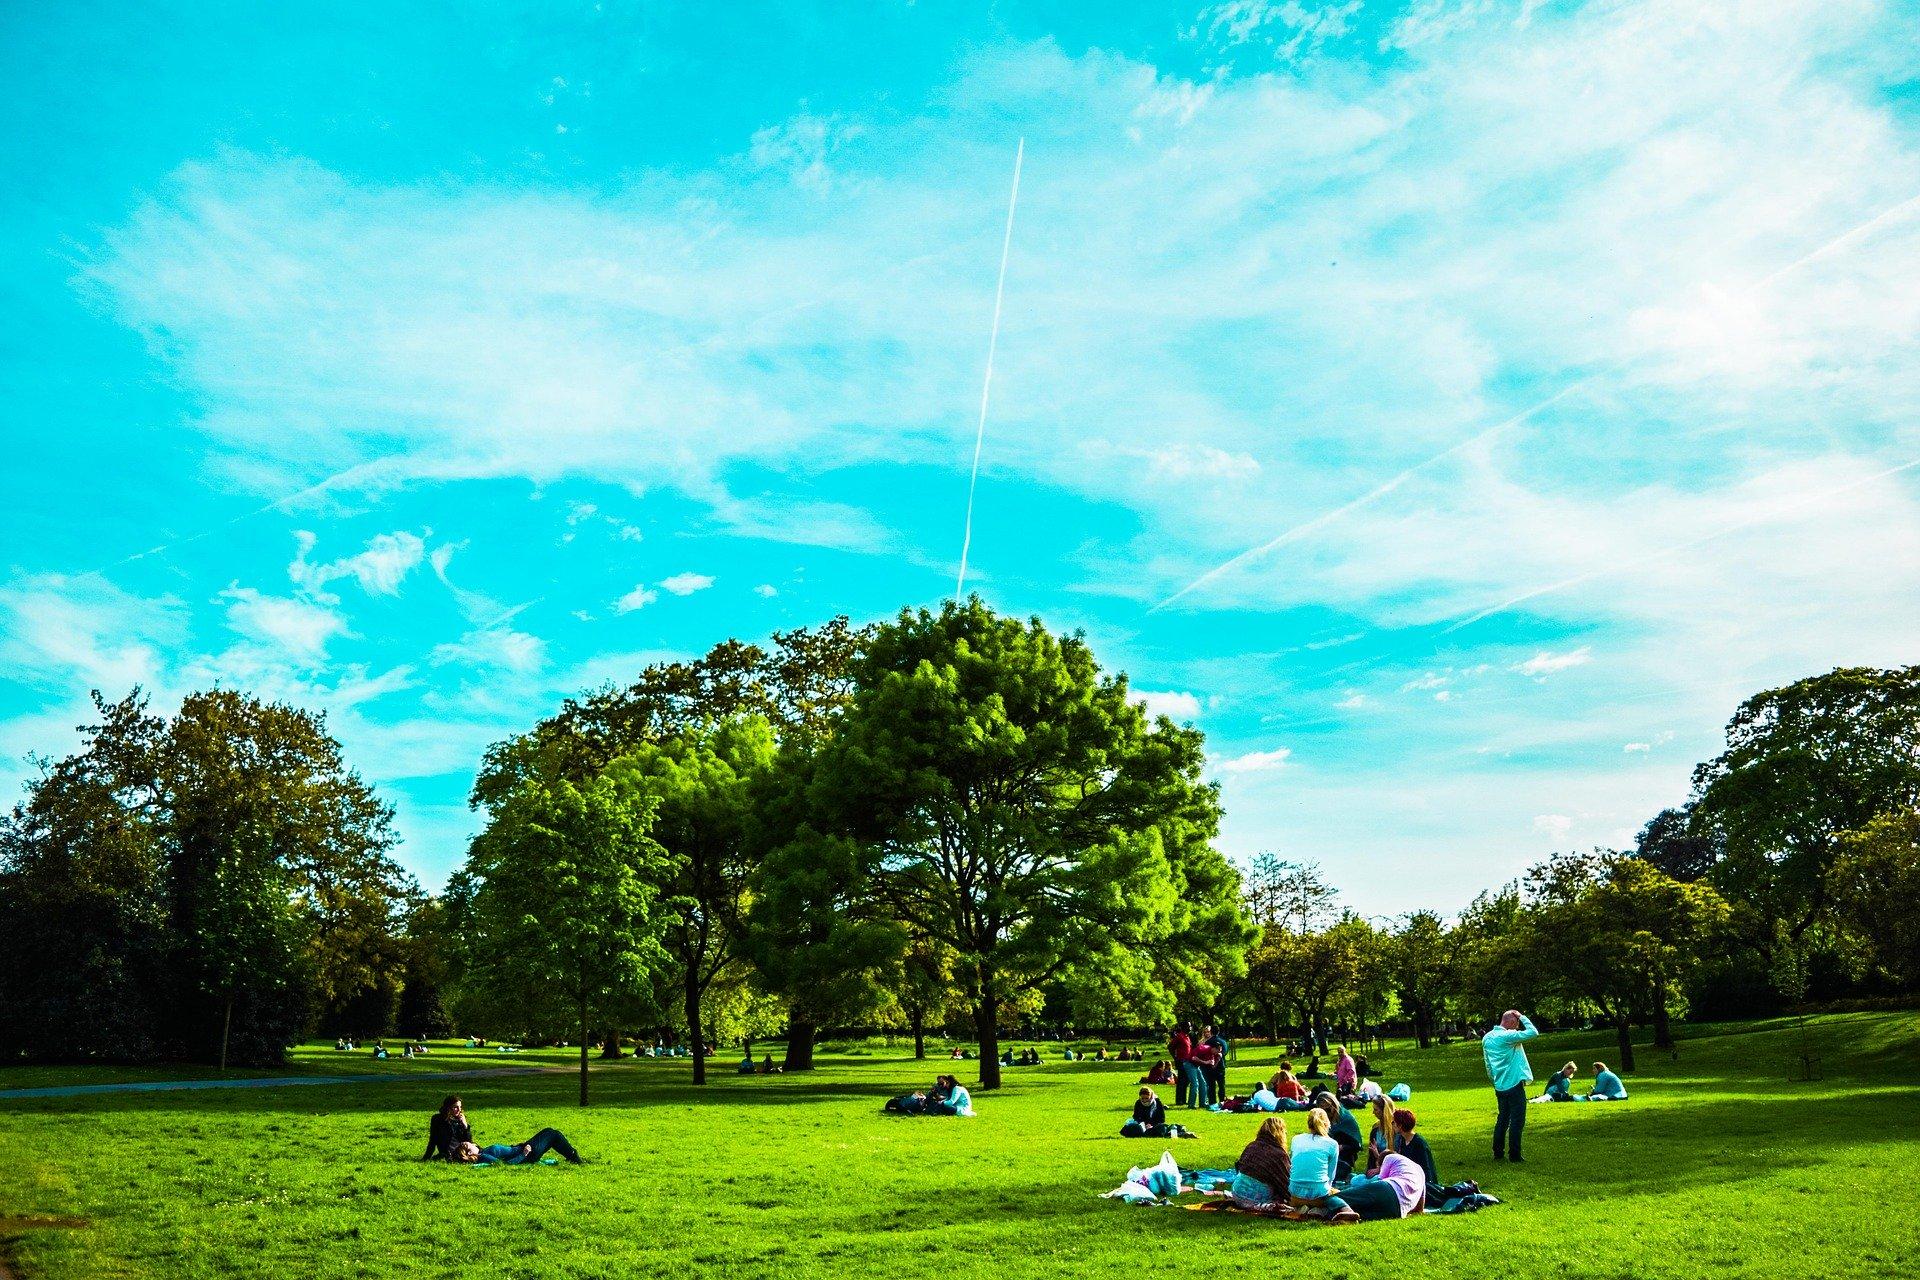 The Green Park, London